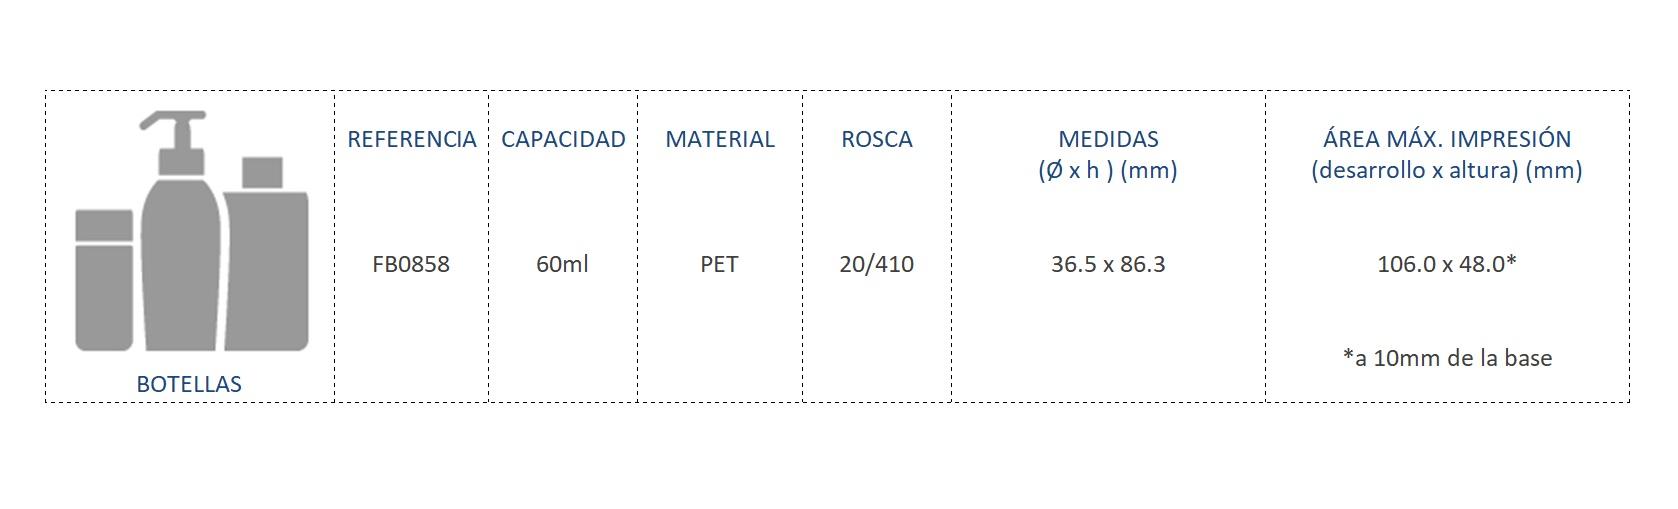 Cuadro de materiales FB0858